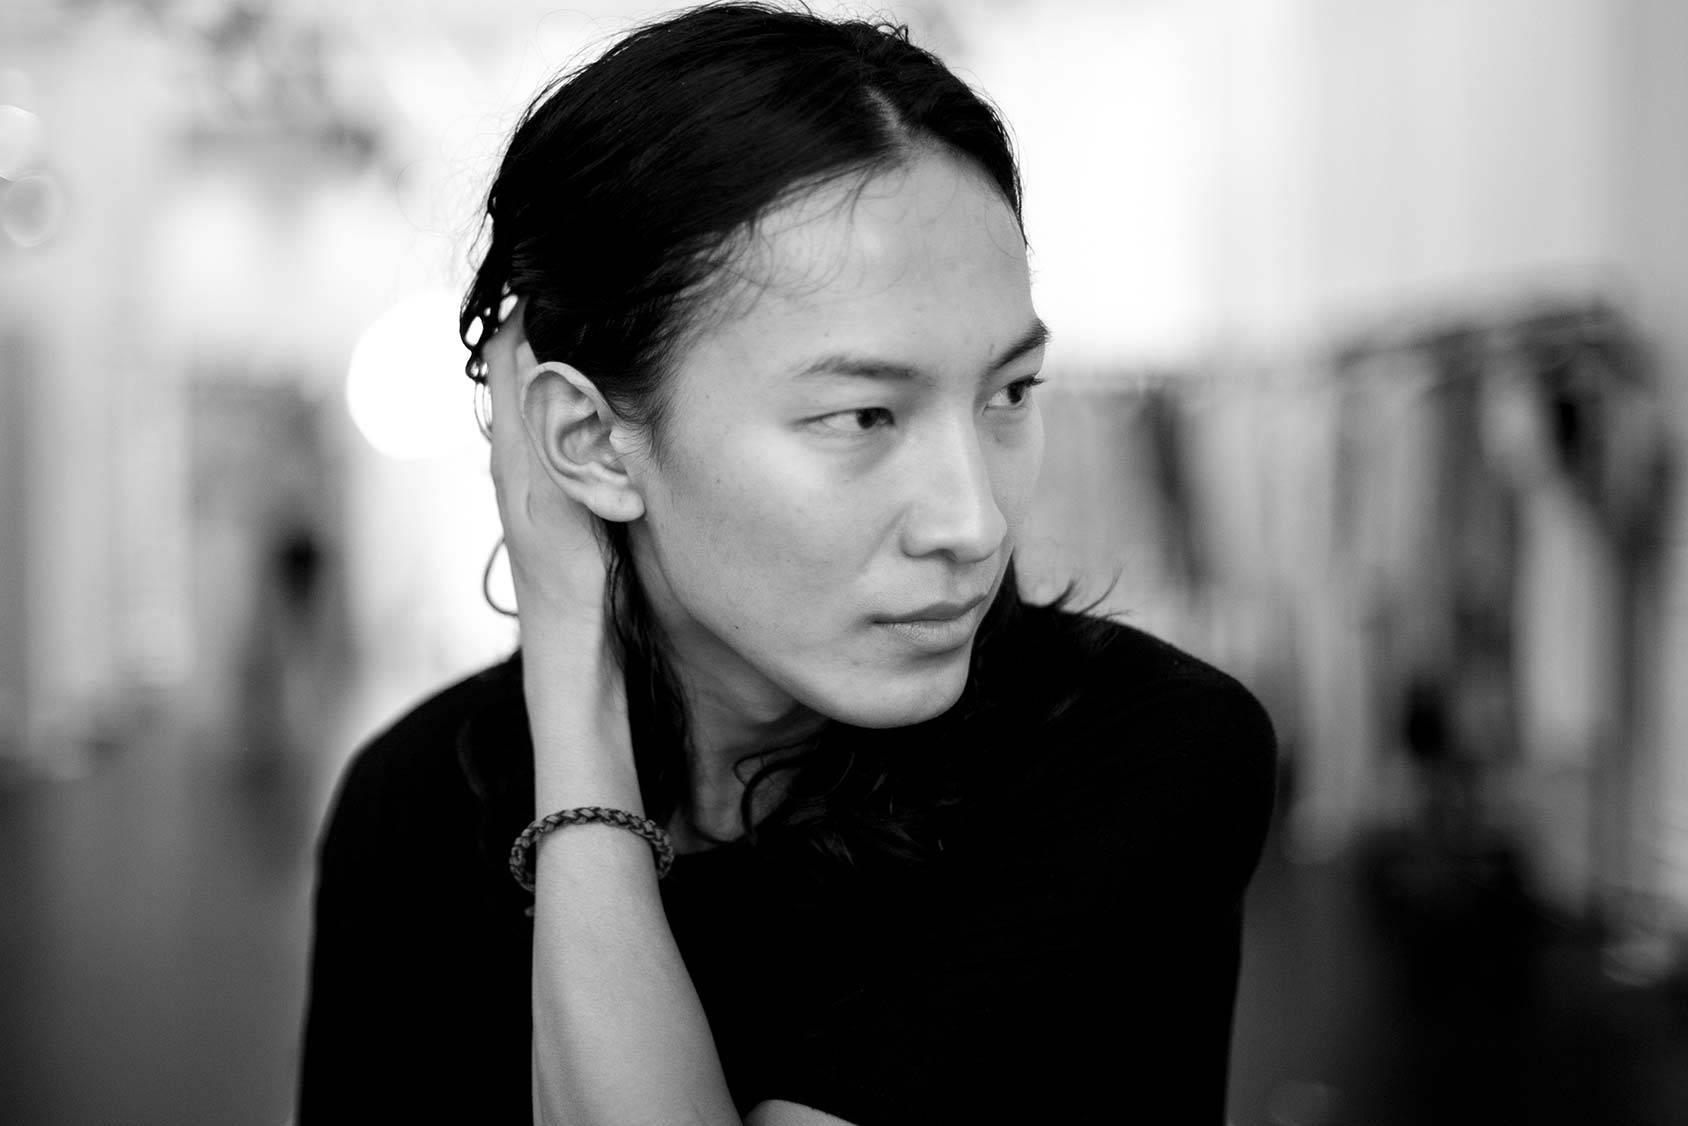 Une collaboration de prestige : adidas x Alexander Wang